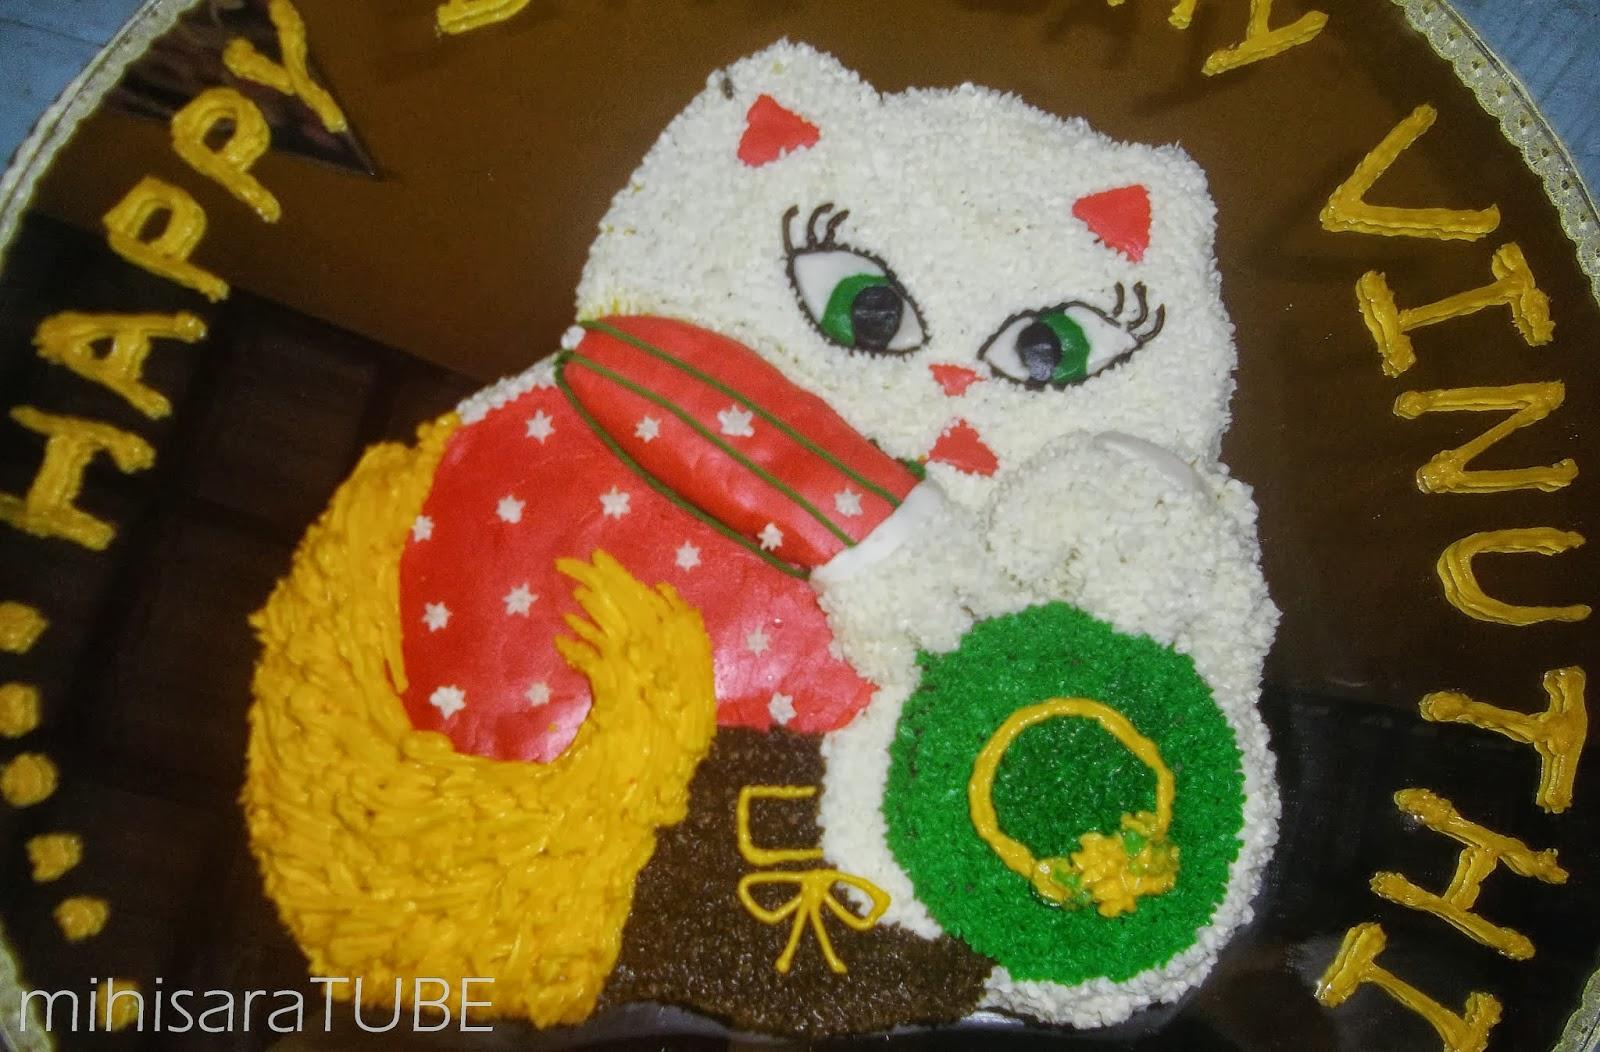 Birthday Cake Designs Collection Mihisaratube